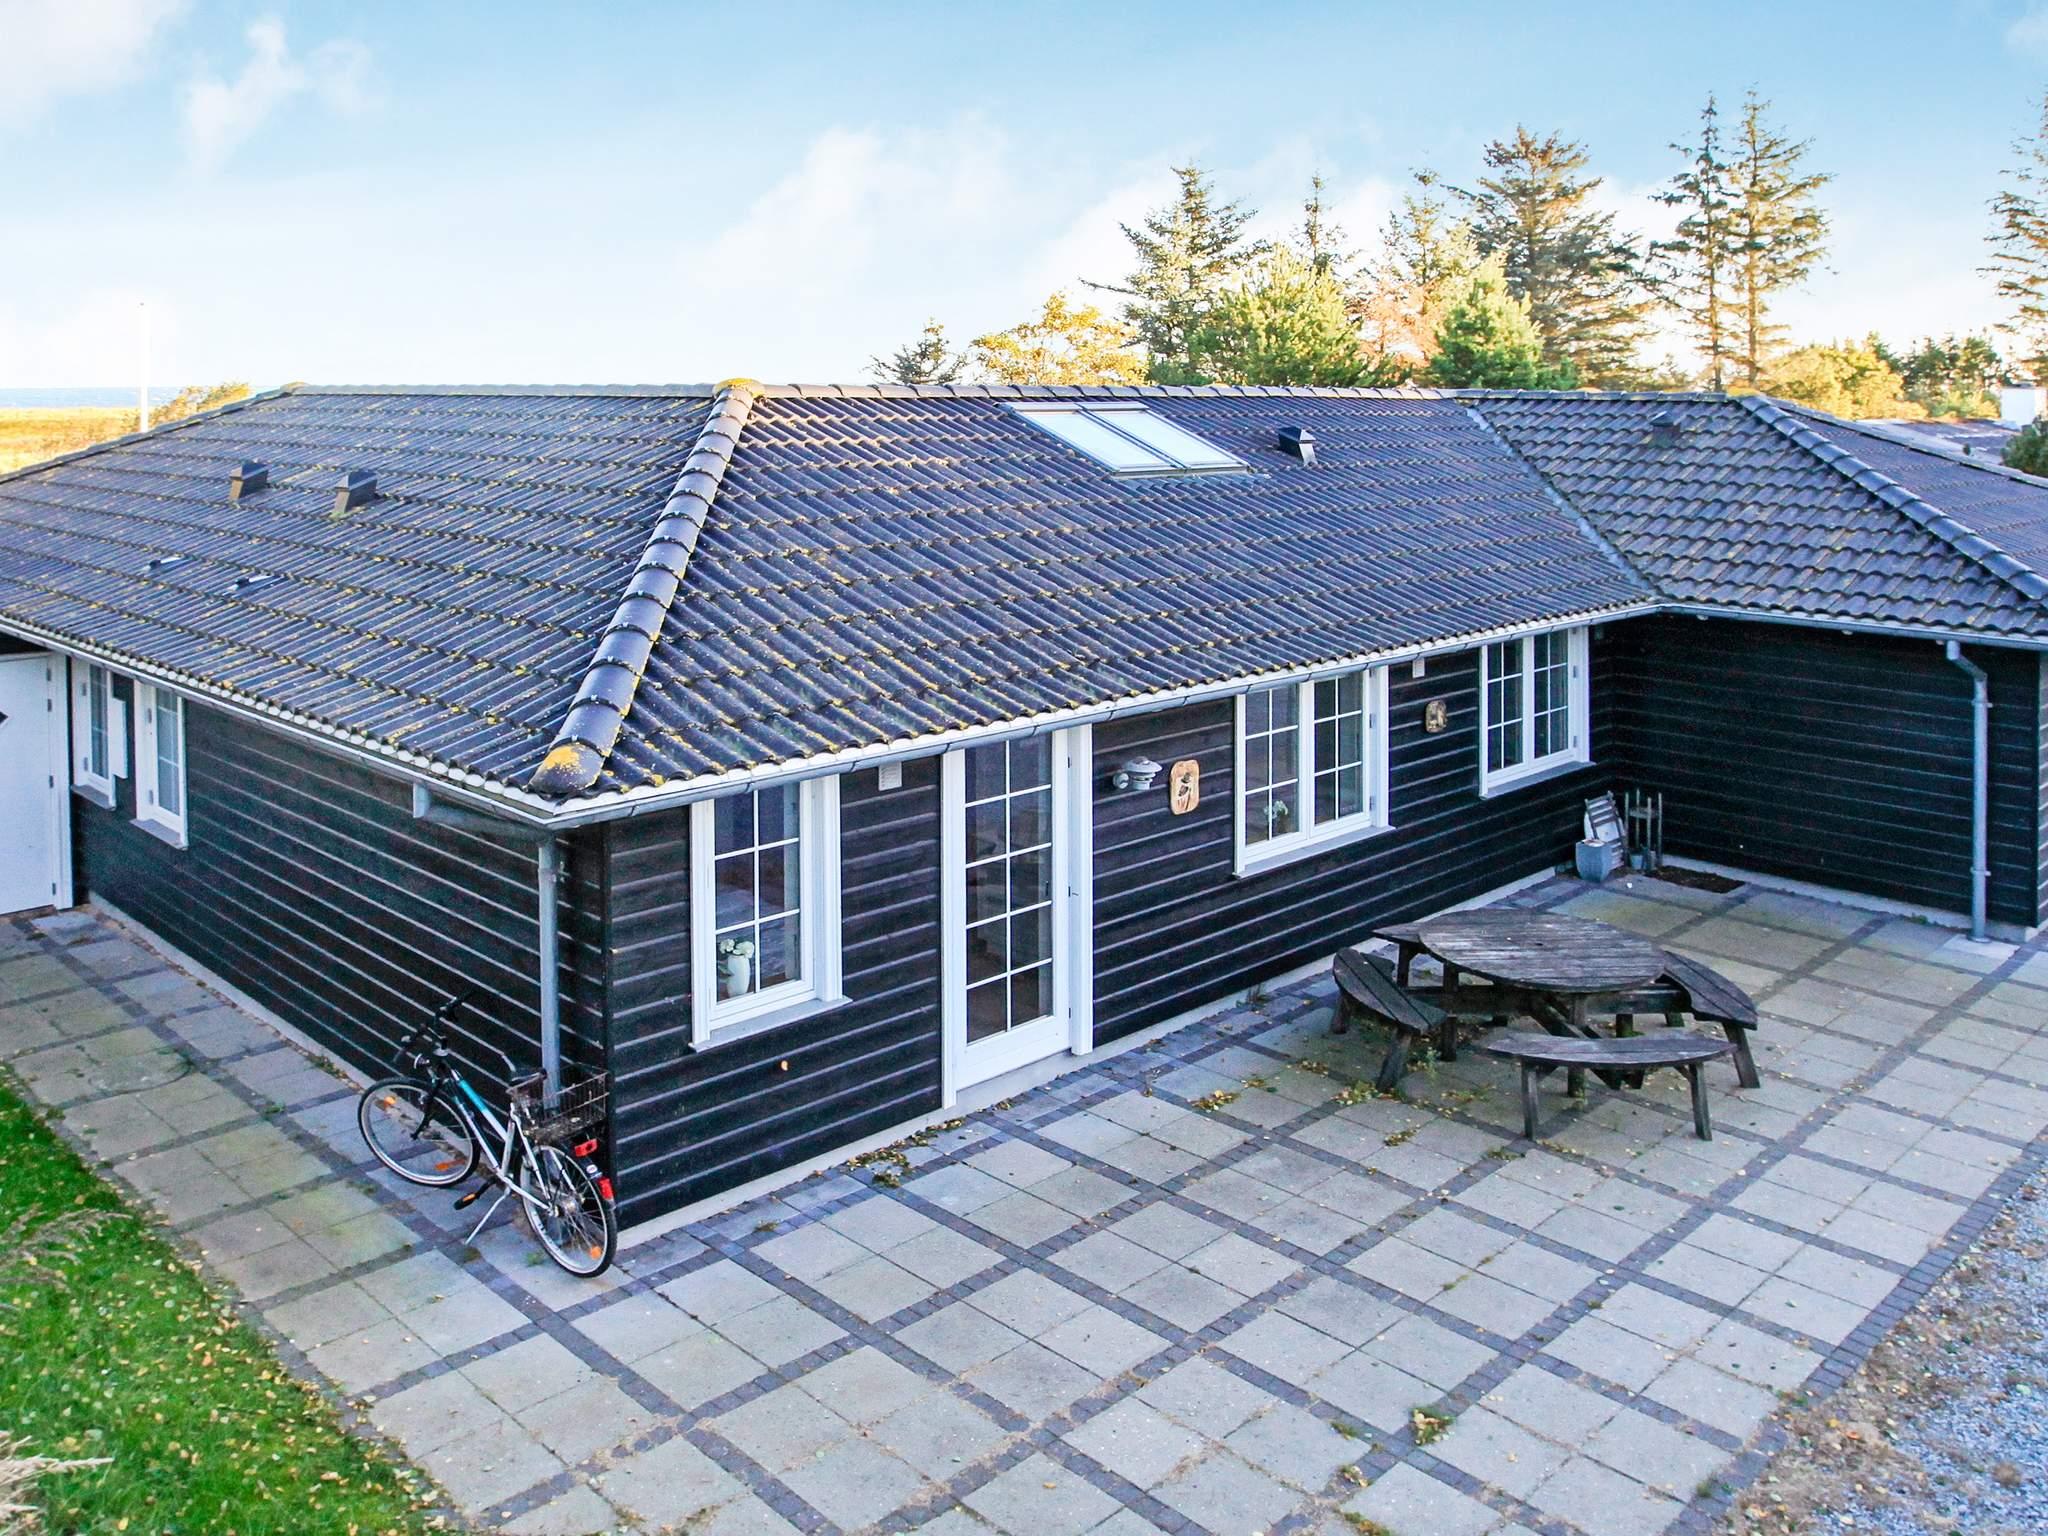 Ferienhaus Hou/Lagunen (317346), Hou, , Dänische Ostsee, Dänemark, Bild 1